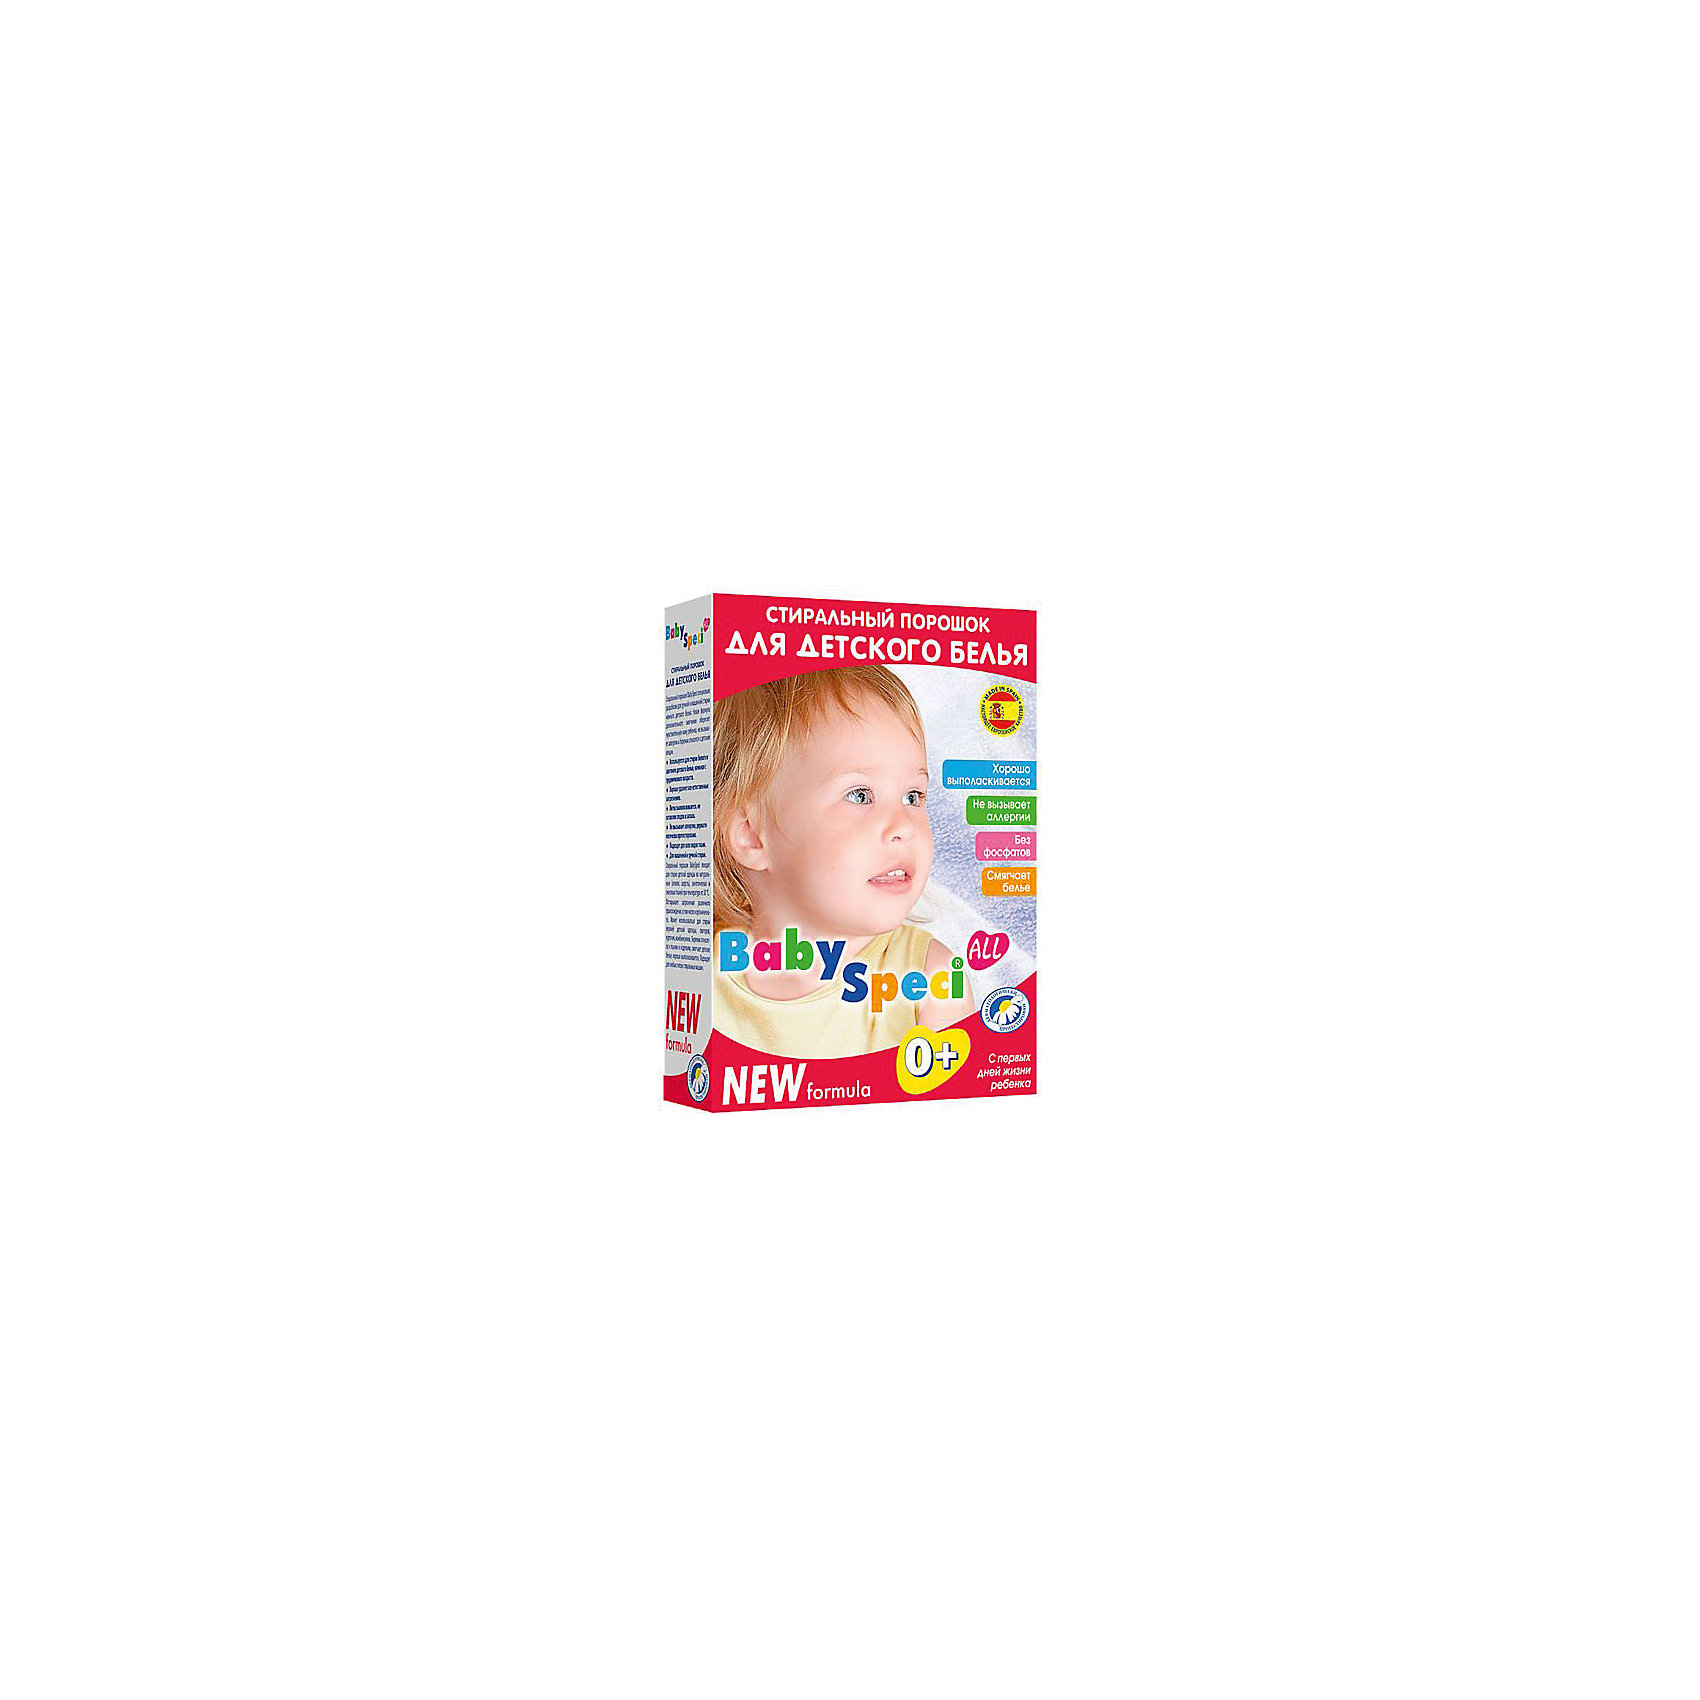 Baby Speci Стиральный порошок 500 гр., Baby Speci стиральный порошок topperr 3205 active